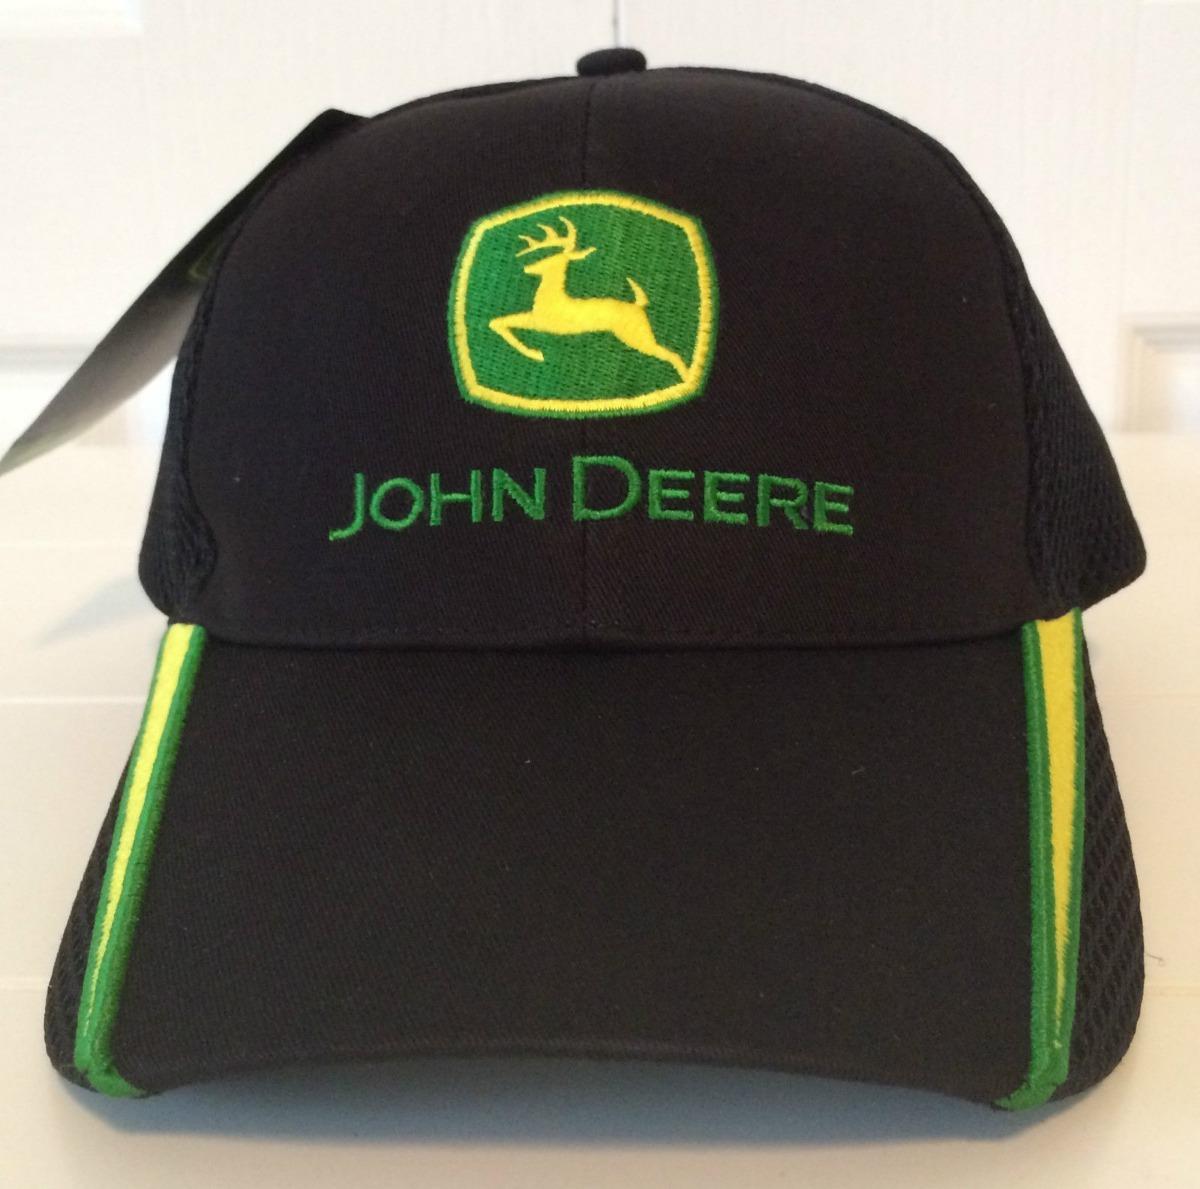 8935dc781c8fa gorra john deere yellow   green embroidery - a pedido exkarg. Cargando zoom.